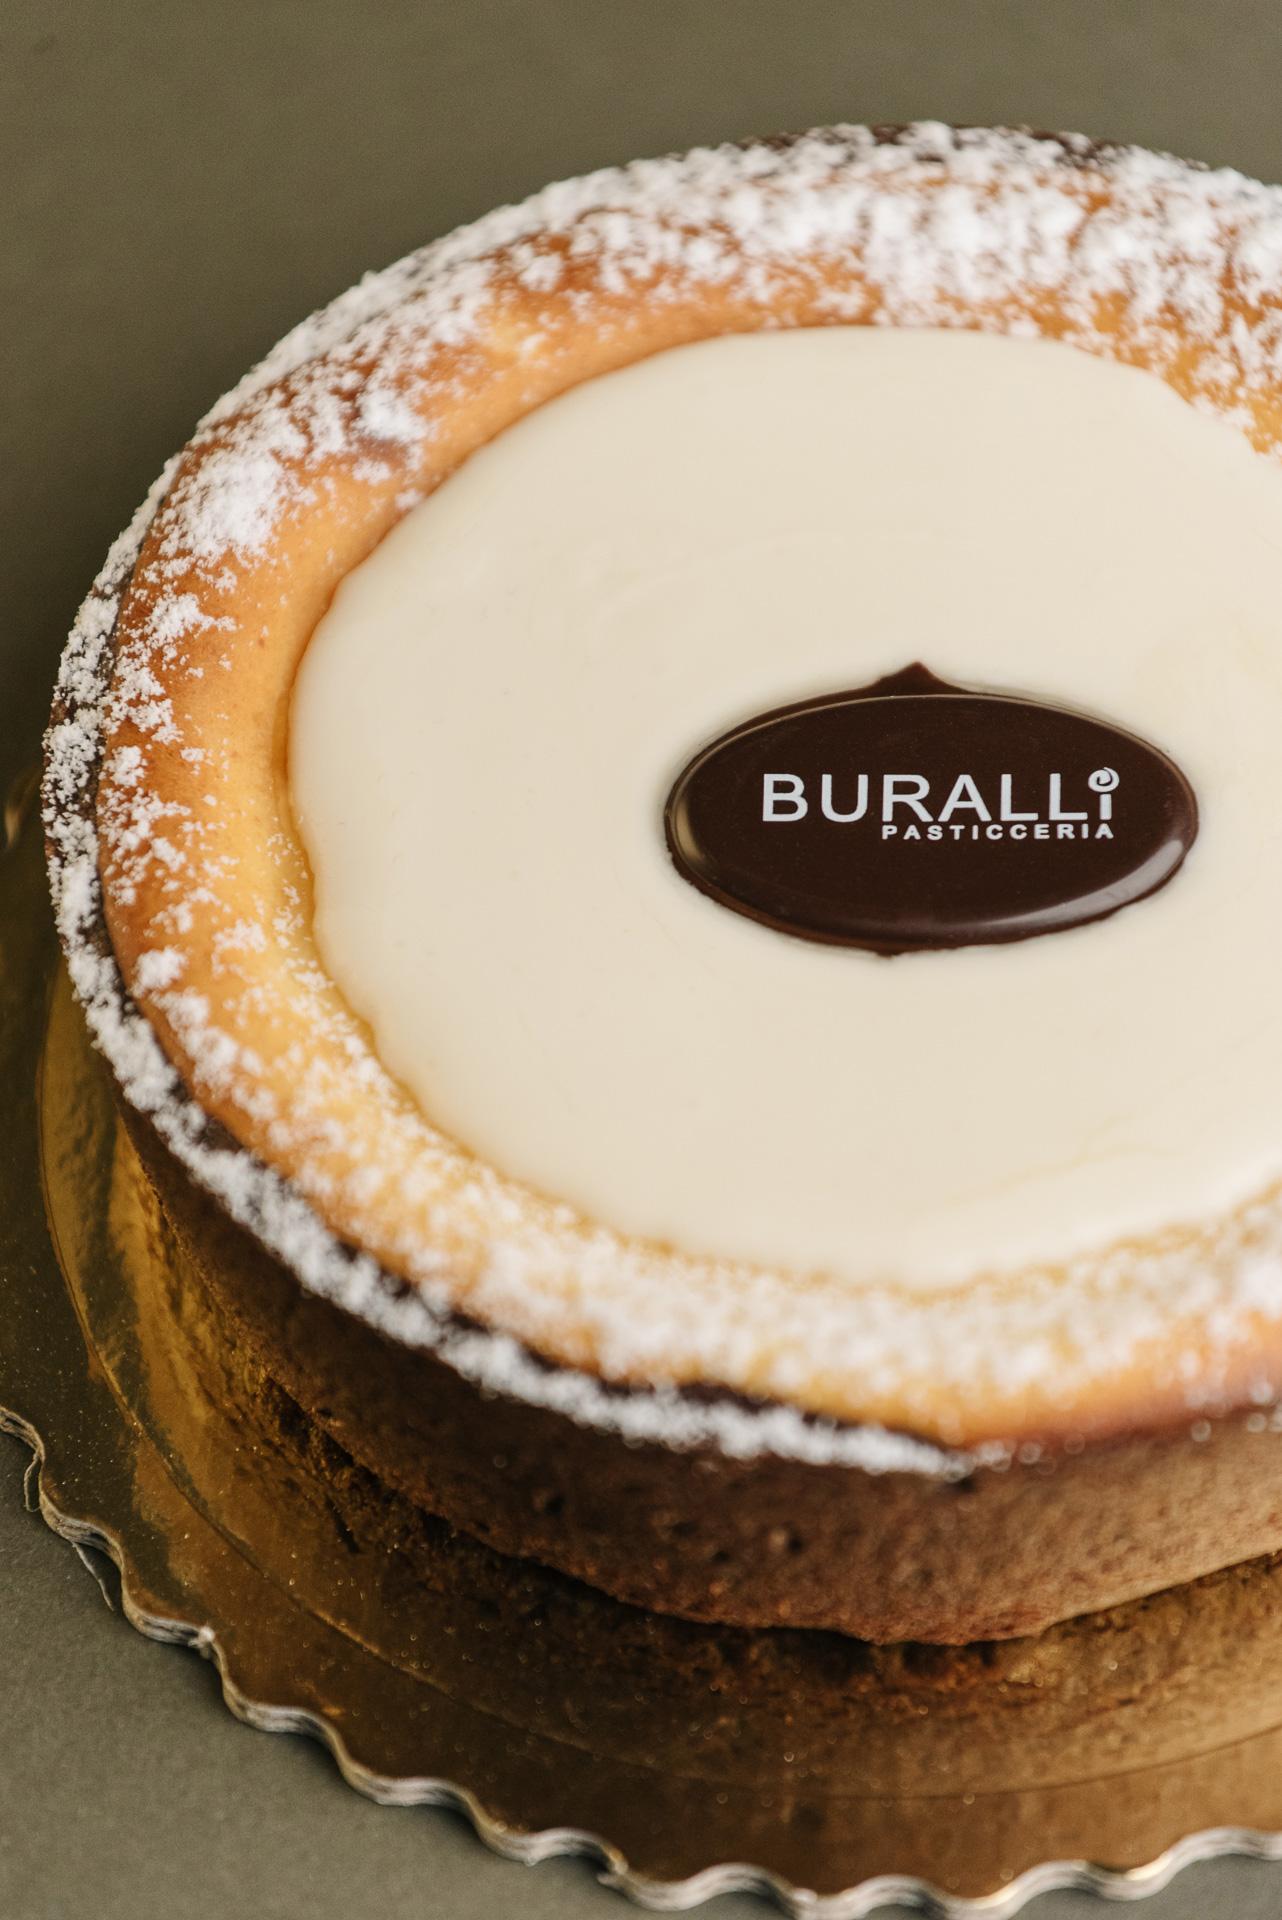 buralli-dolci-1